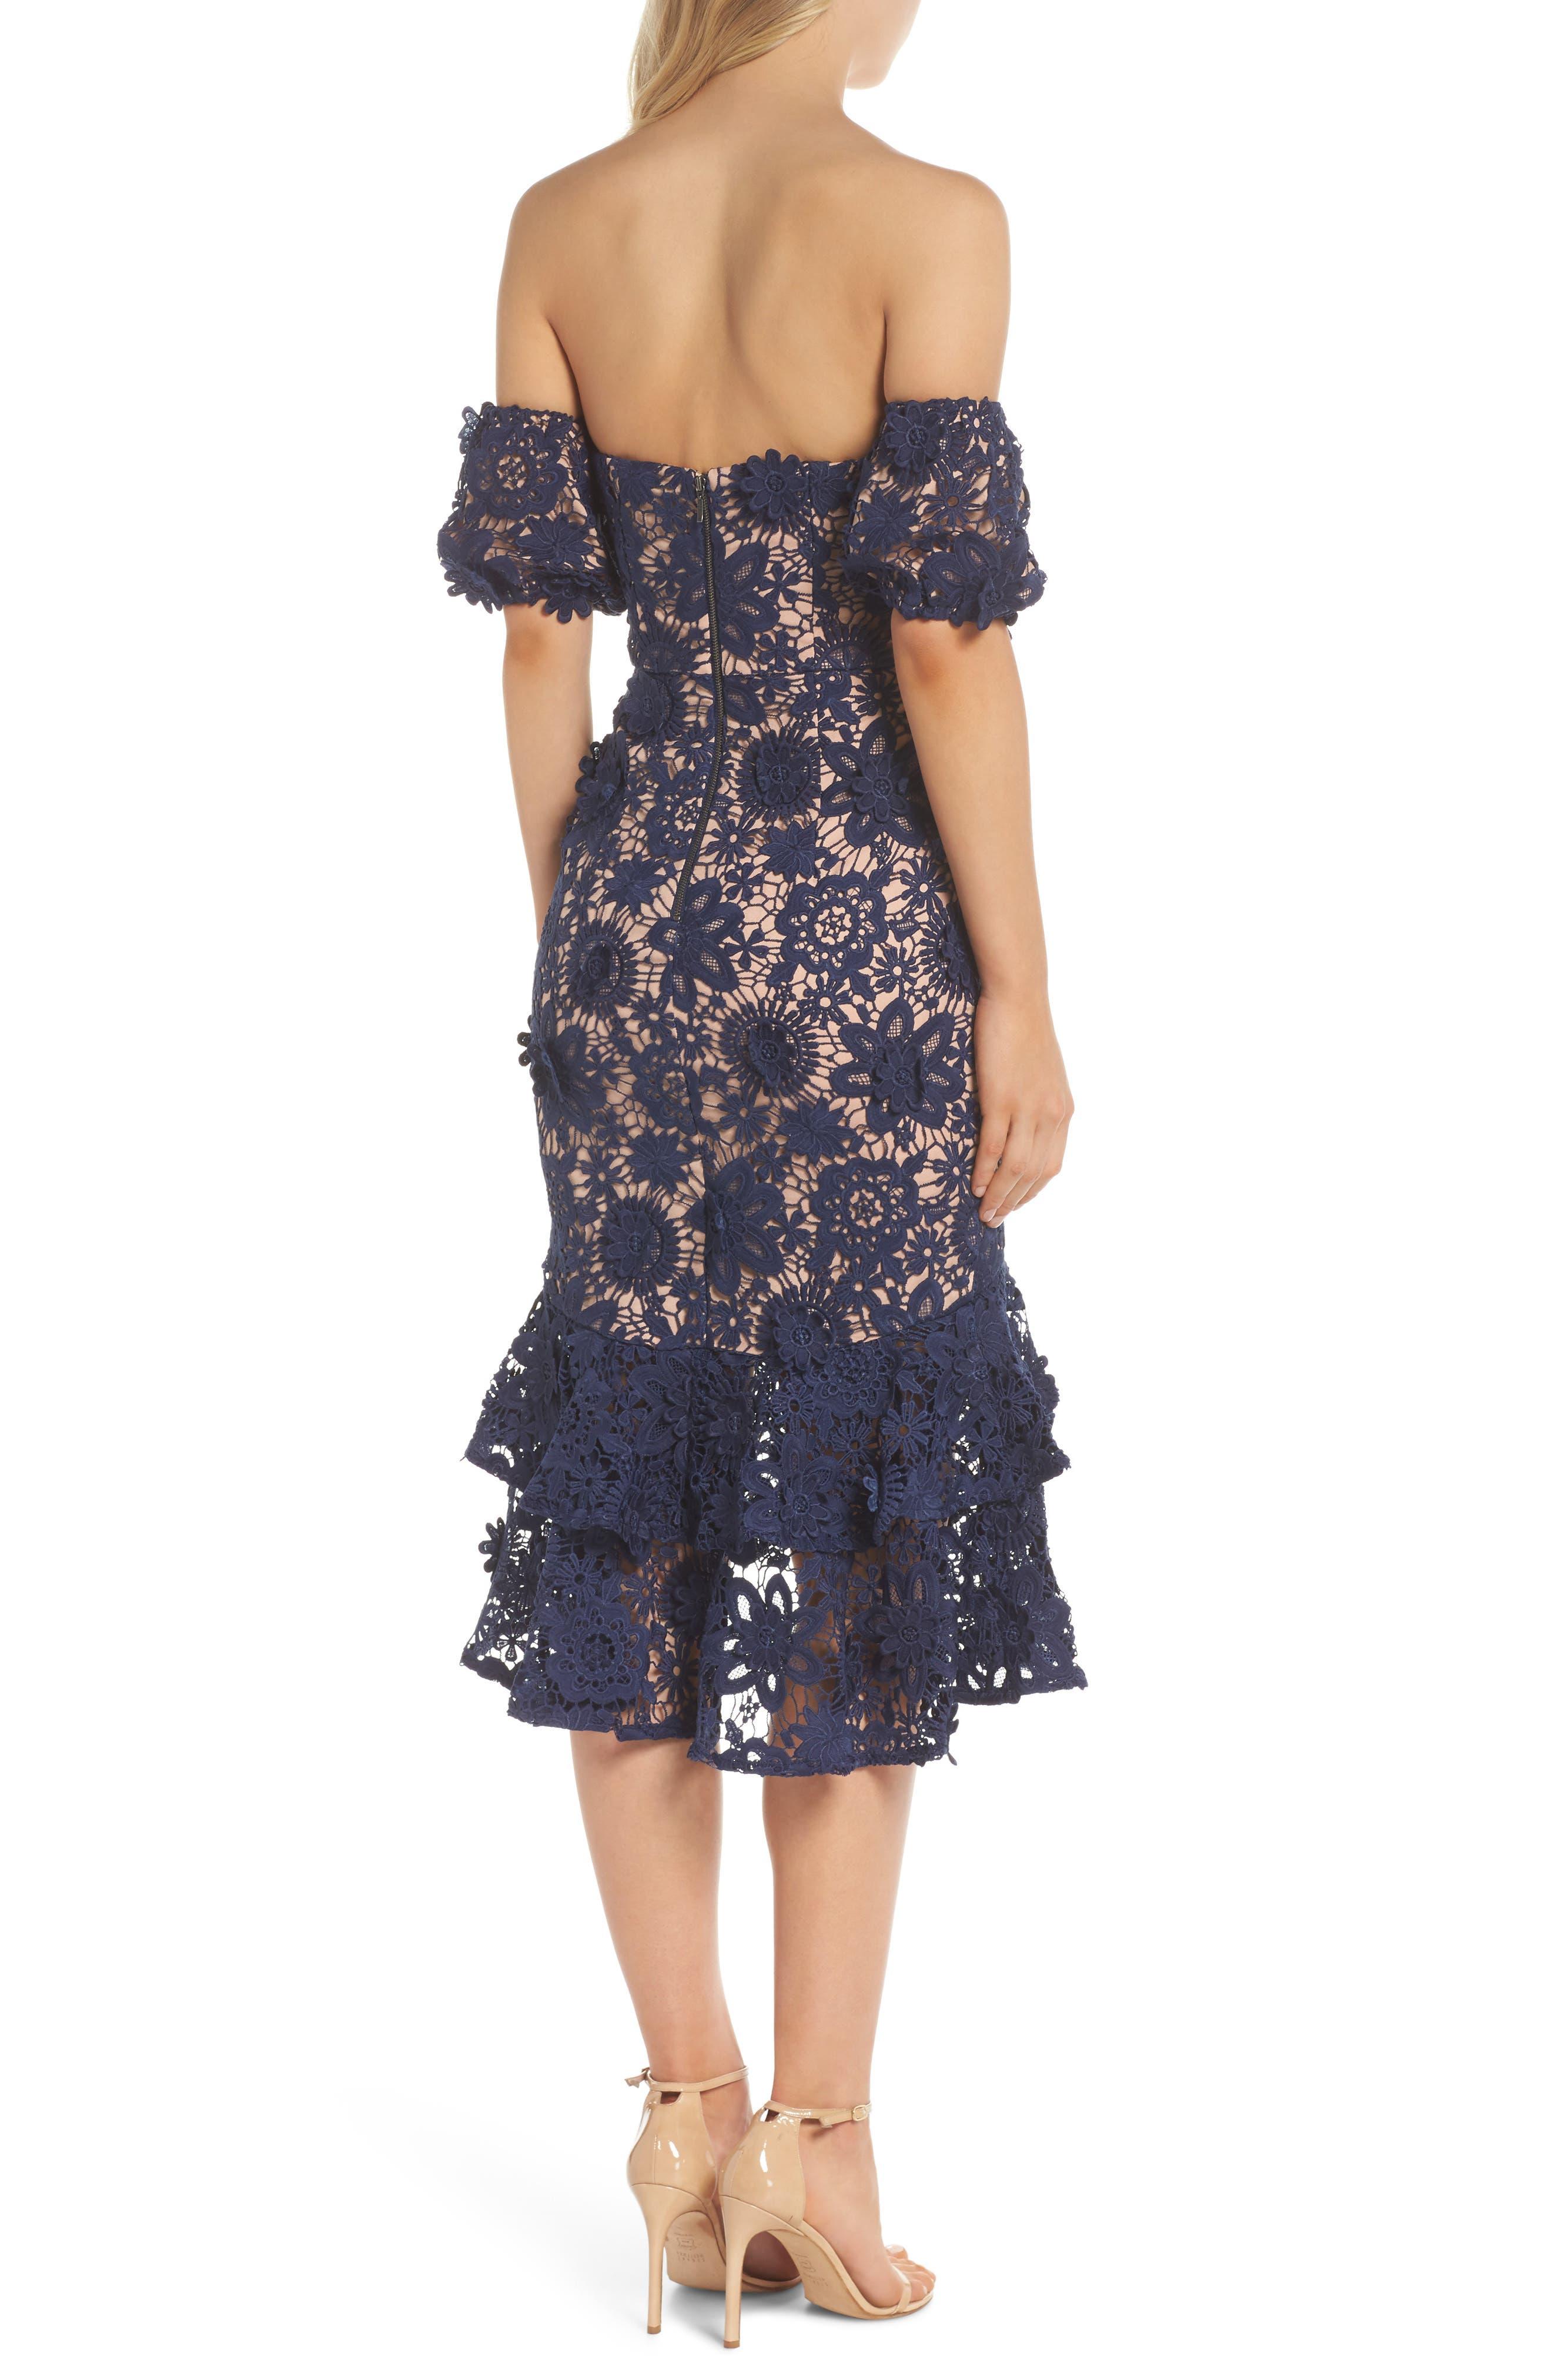 Merrilee Off the Shoulder 3D Lace Dress,                             Alternate thumbnail 2, color,                             NAVY